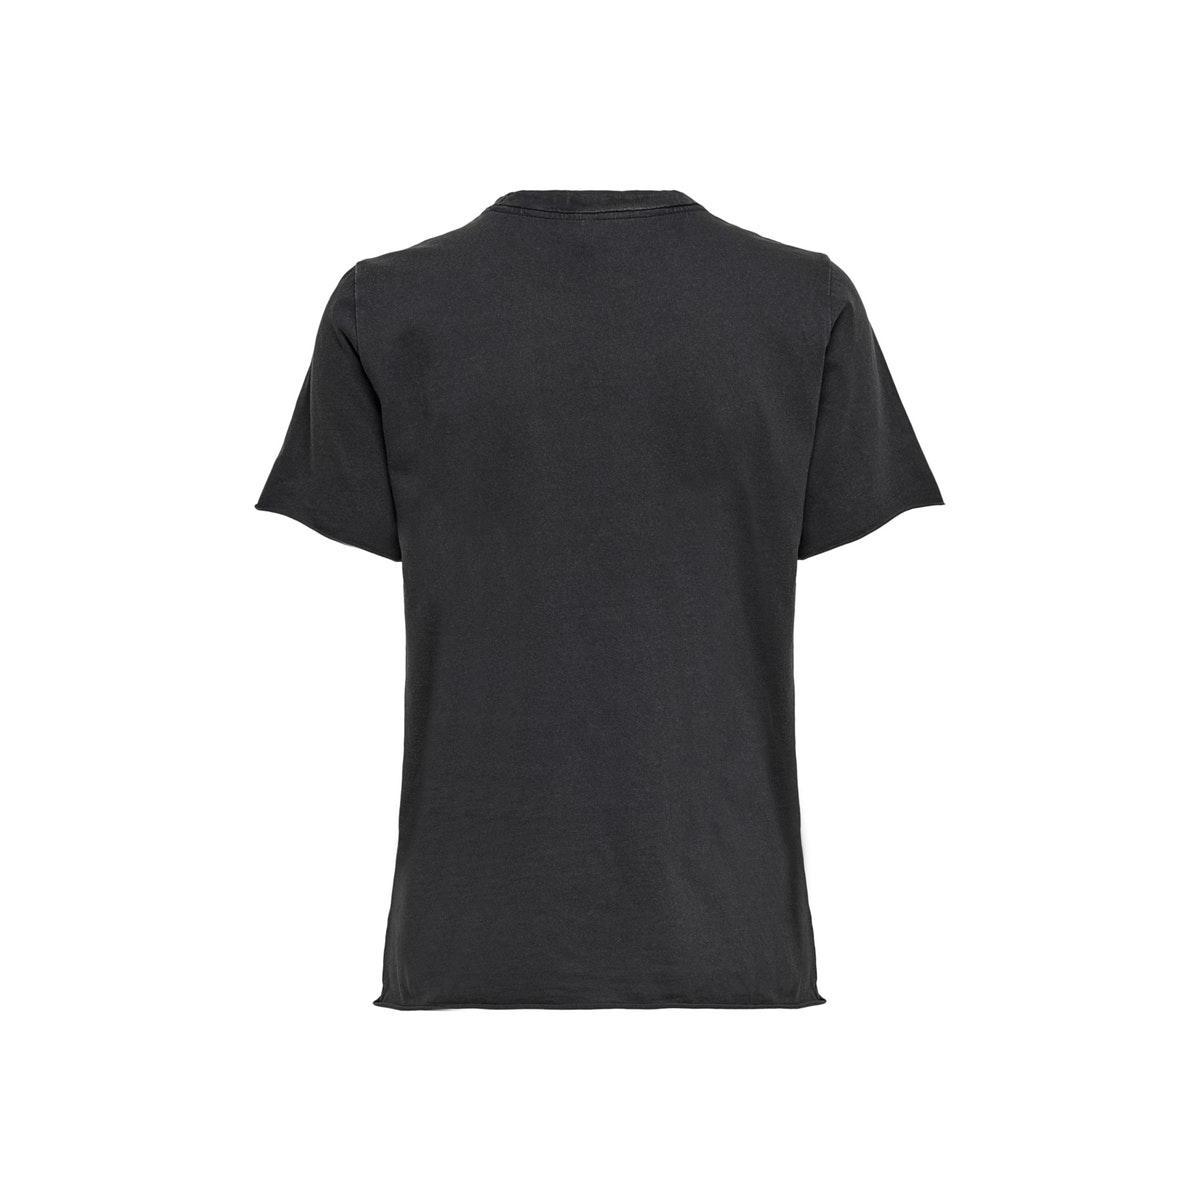 onllucy life reg s/s palm top jrs 15213080 only t-shirt black/beach